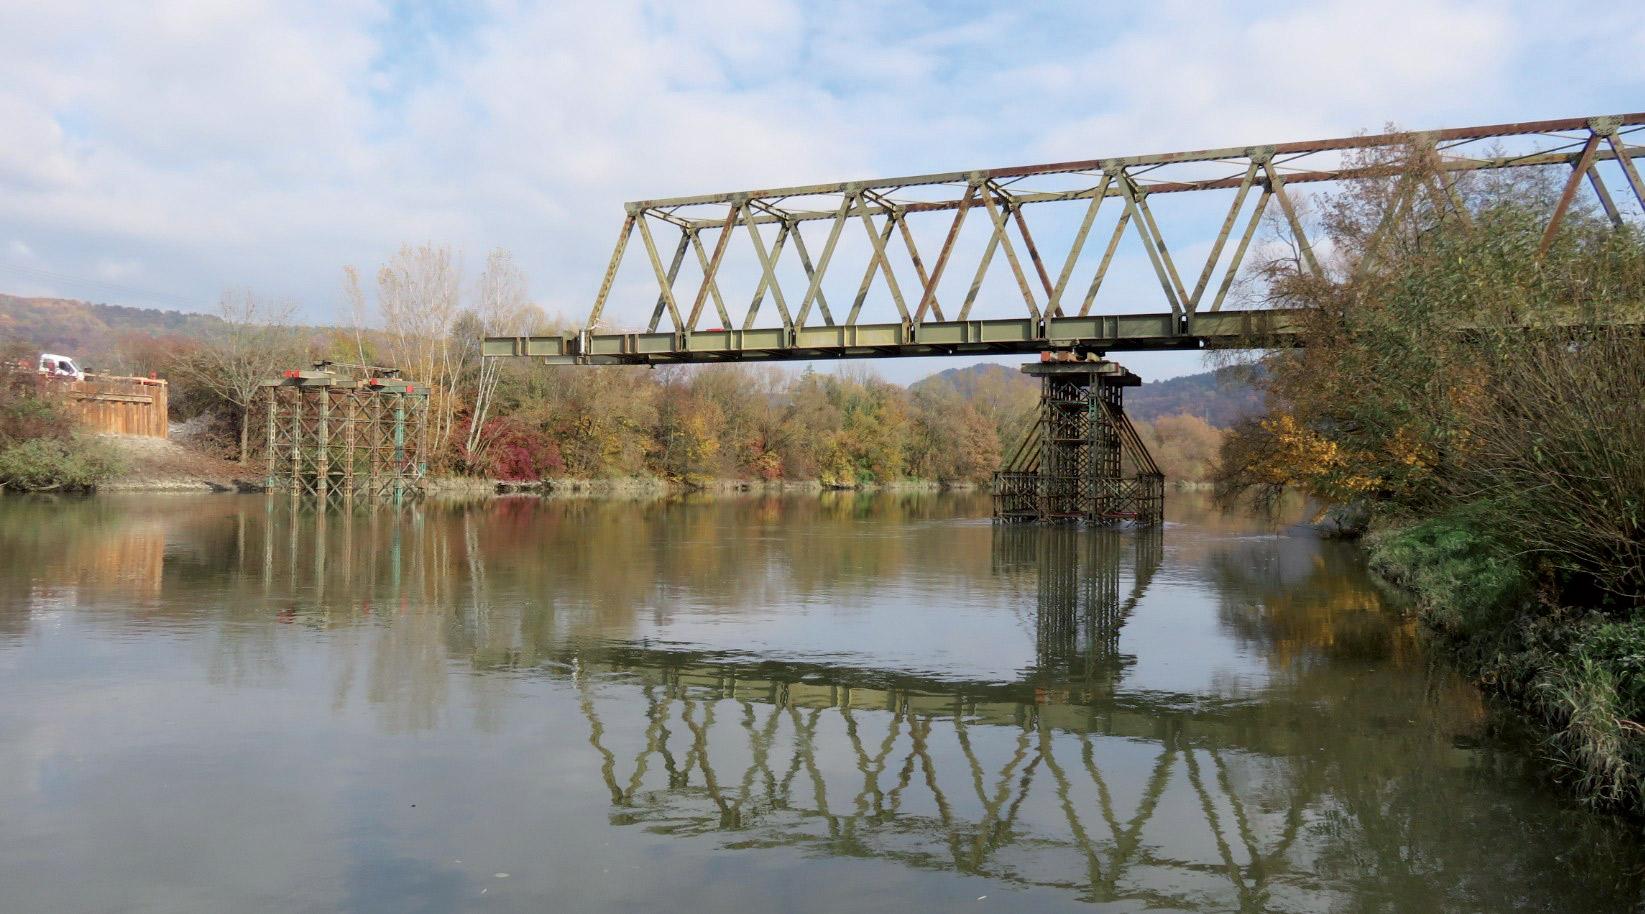 Obr 1 Mostne provizorium